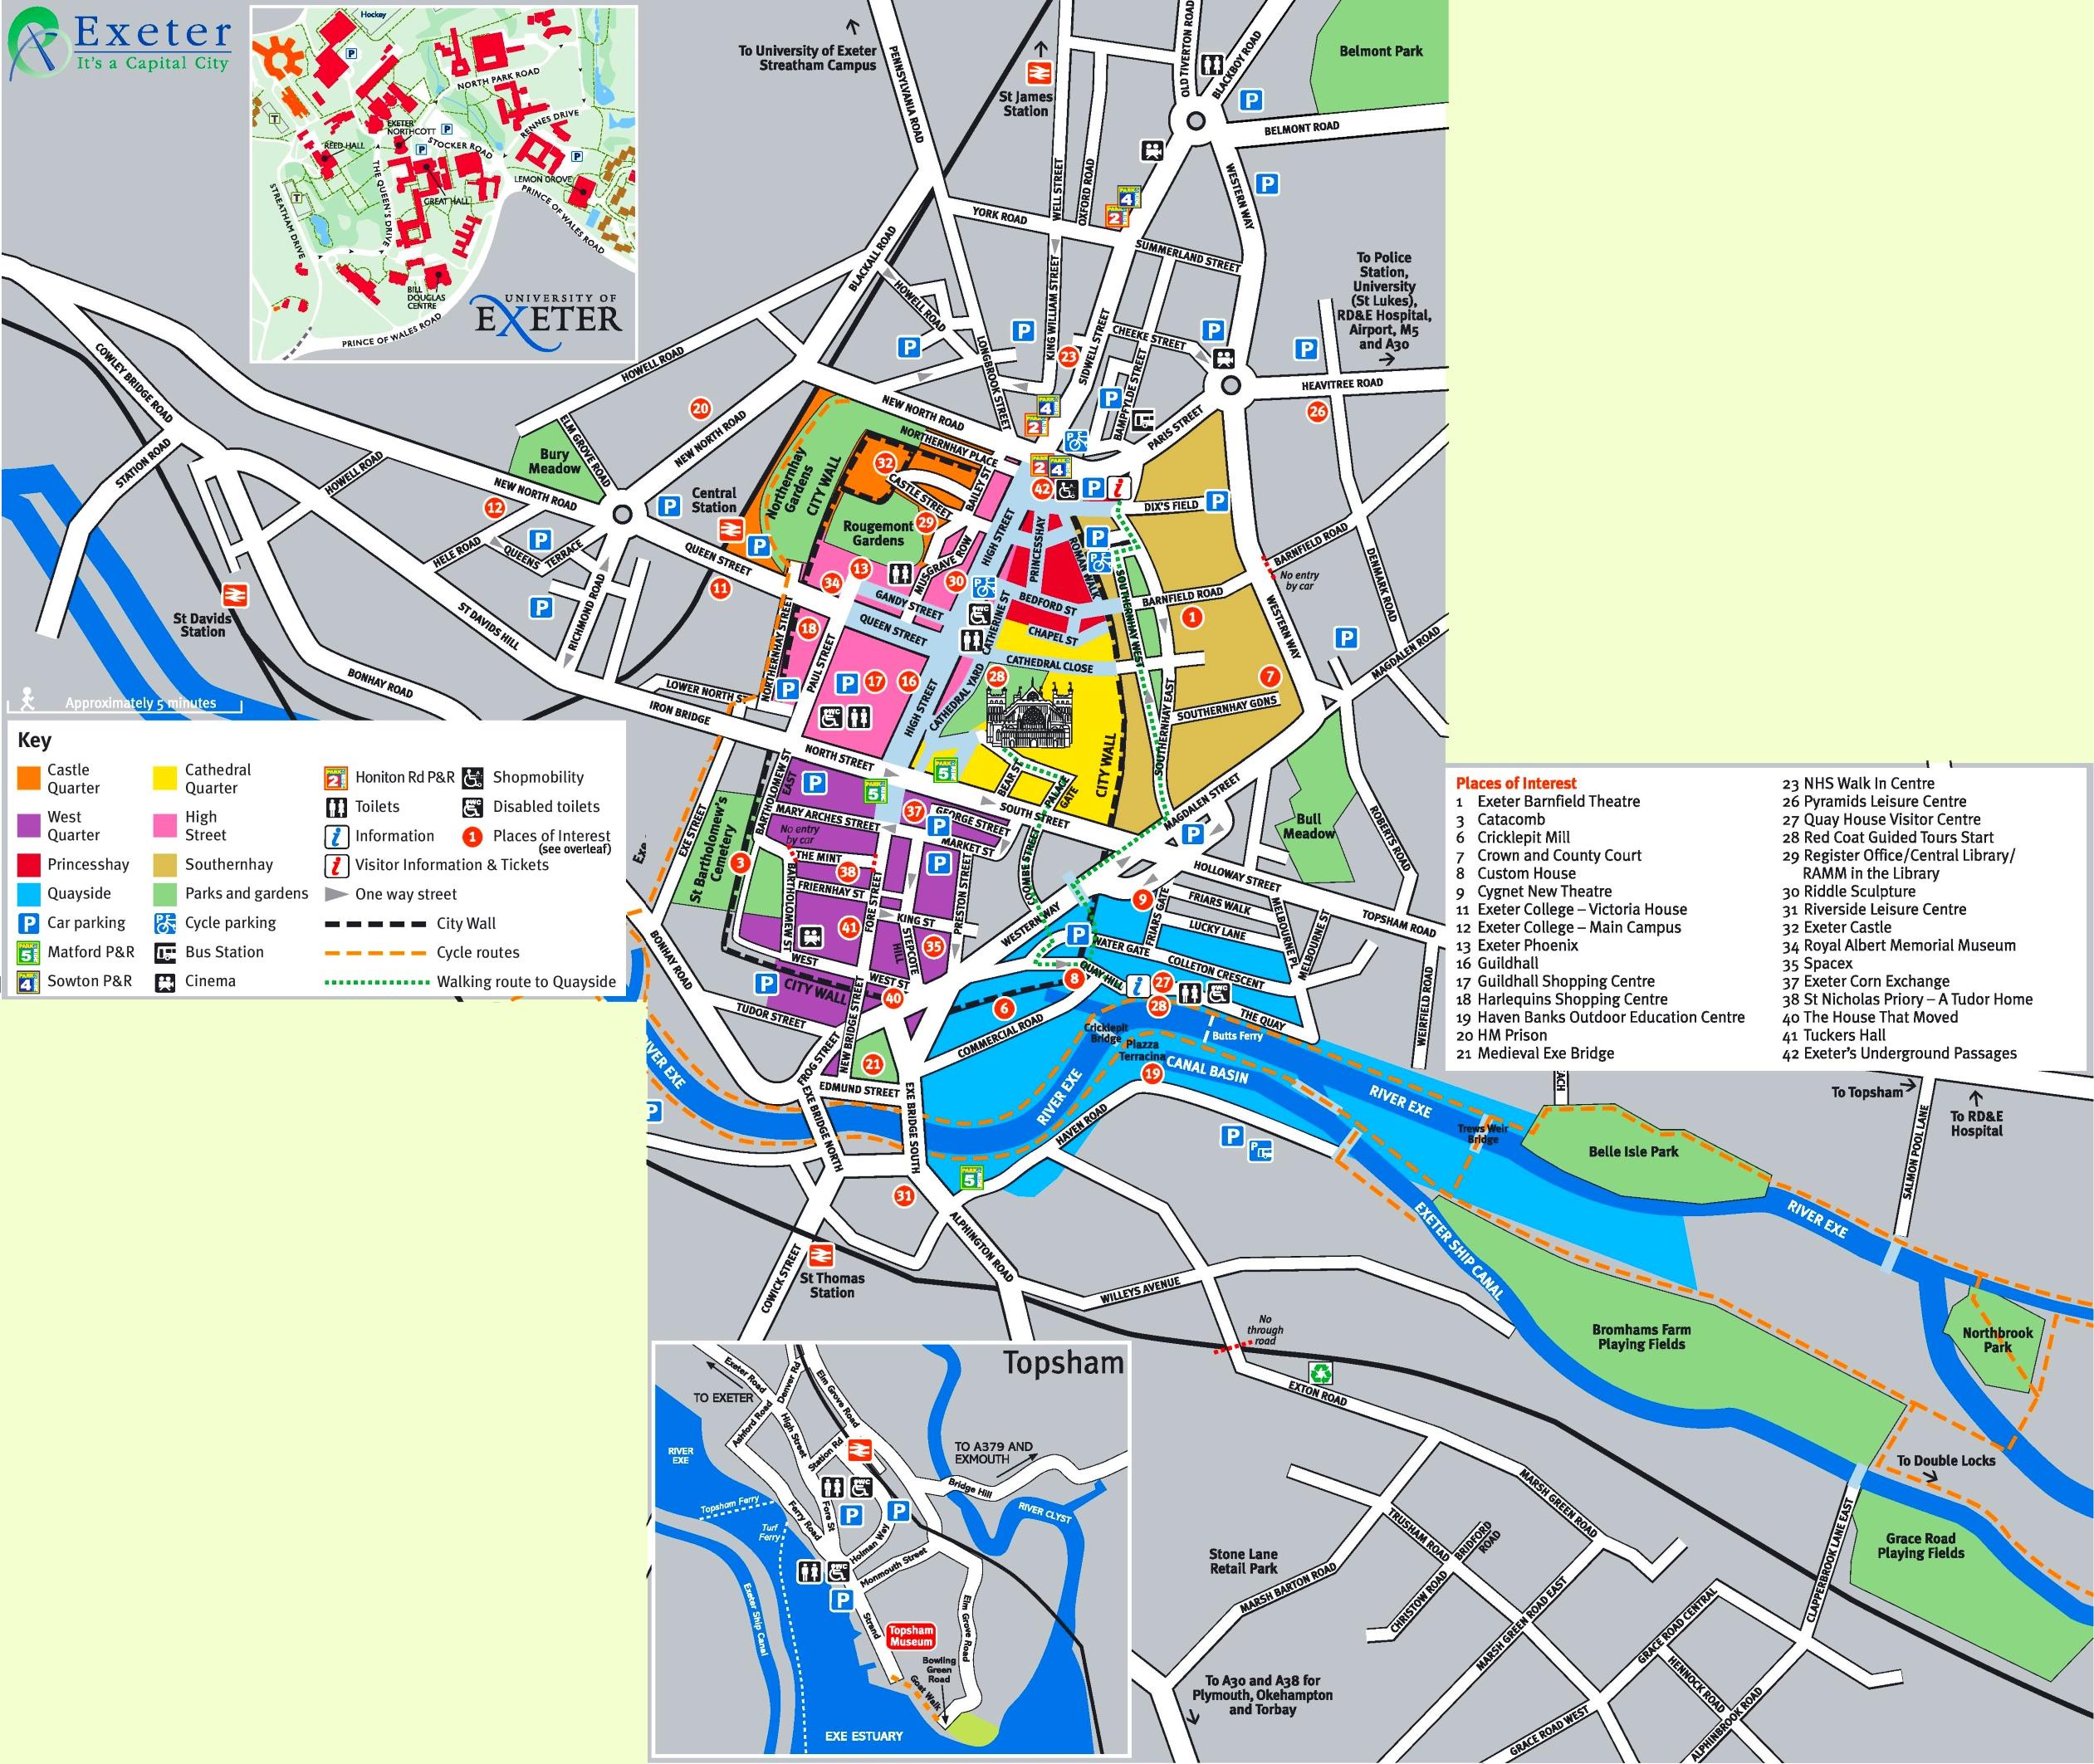 Map Of Exeter Exeter tourist map Map Of Exeter